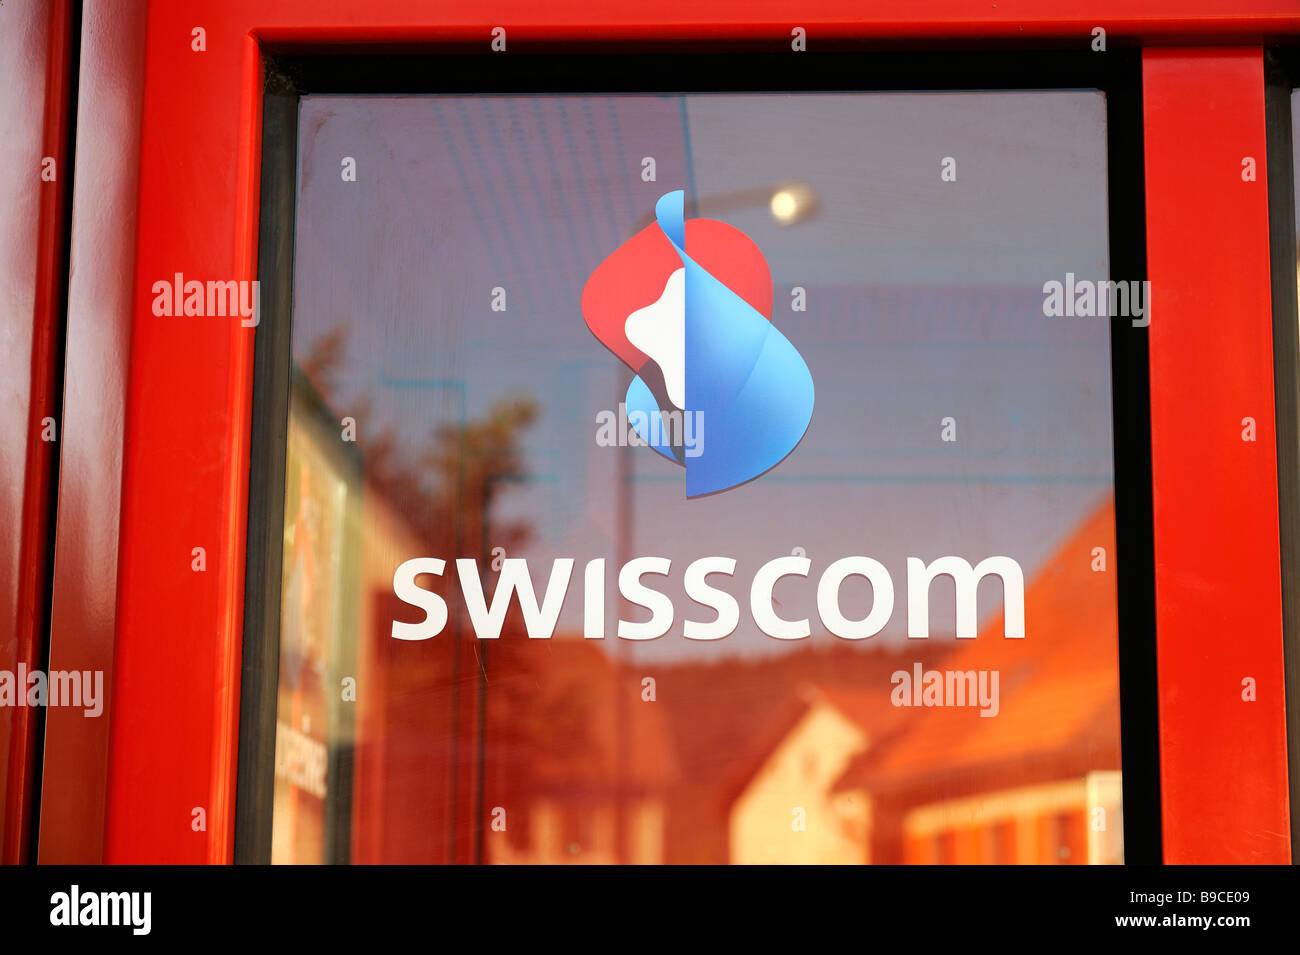 swisscom telephone booth in switzerland - Stock Image